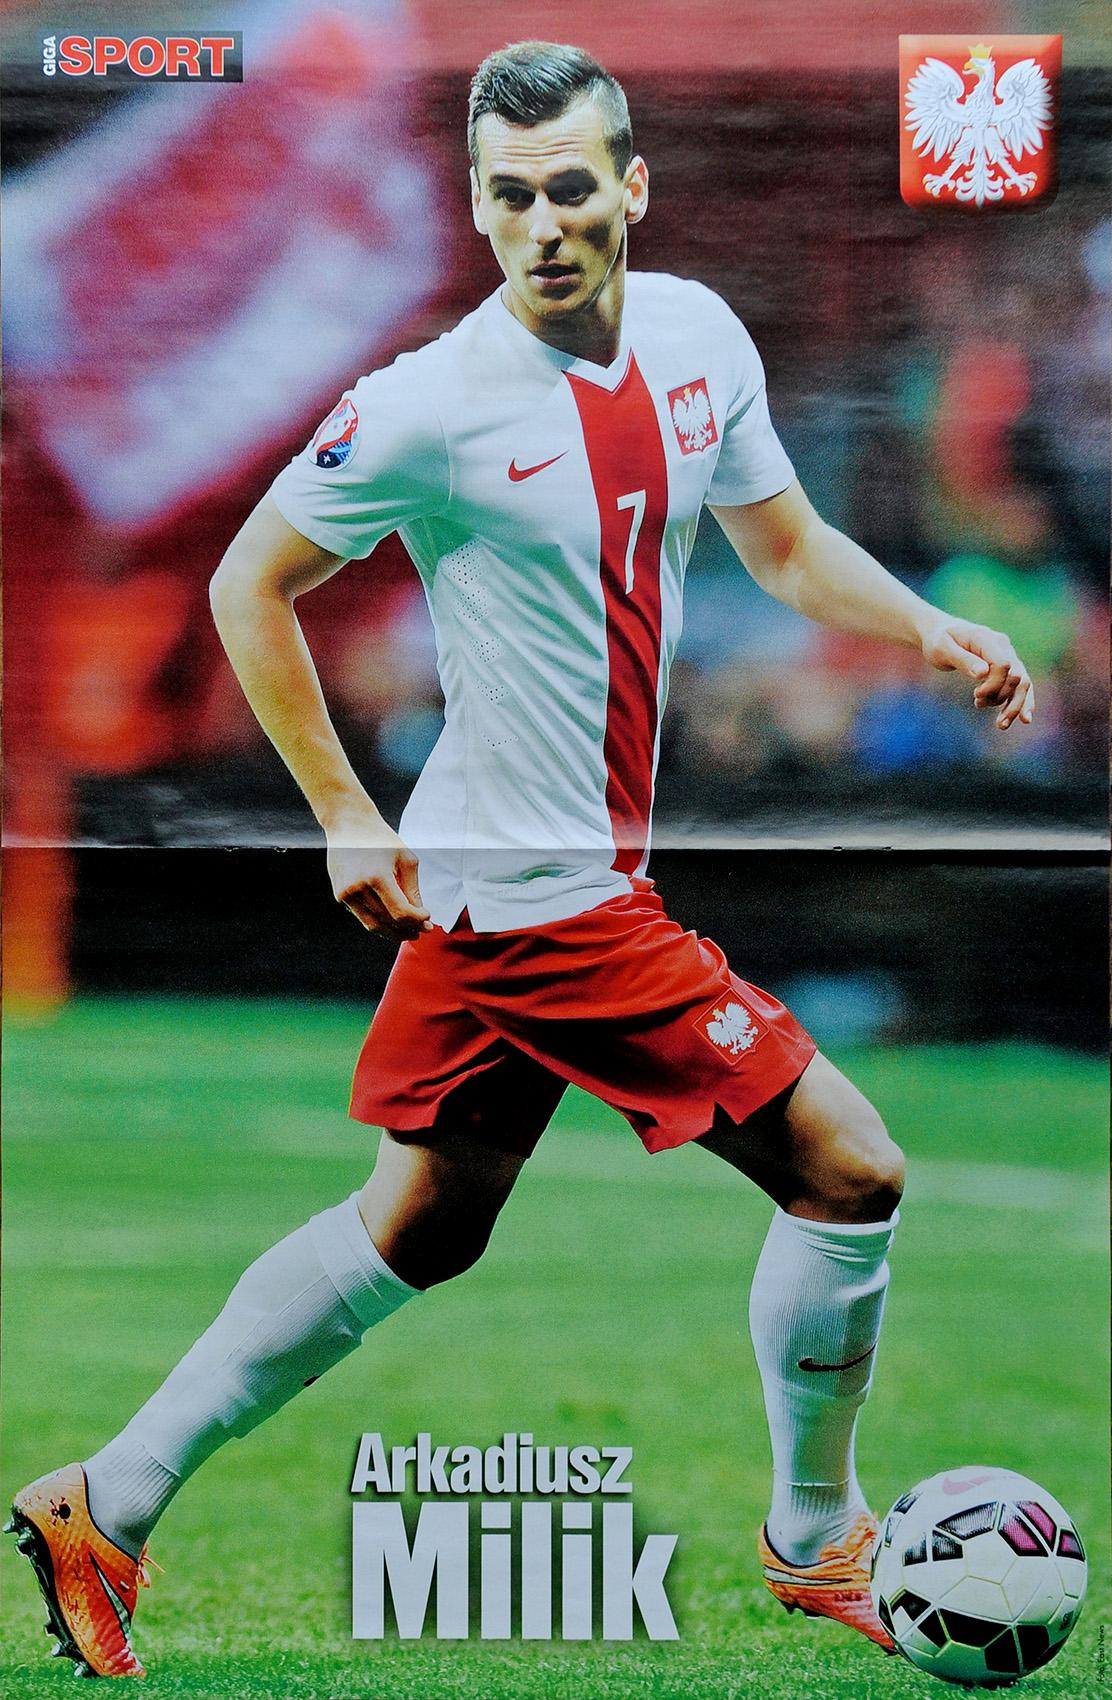 GIGA SPORT nr 12/2014 s. 46 - Arkadiusz Milik - plakat